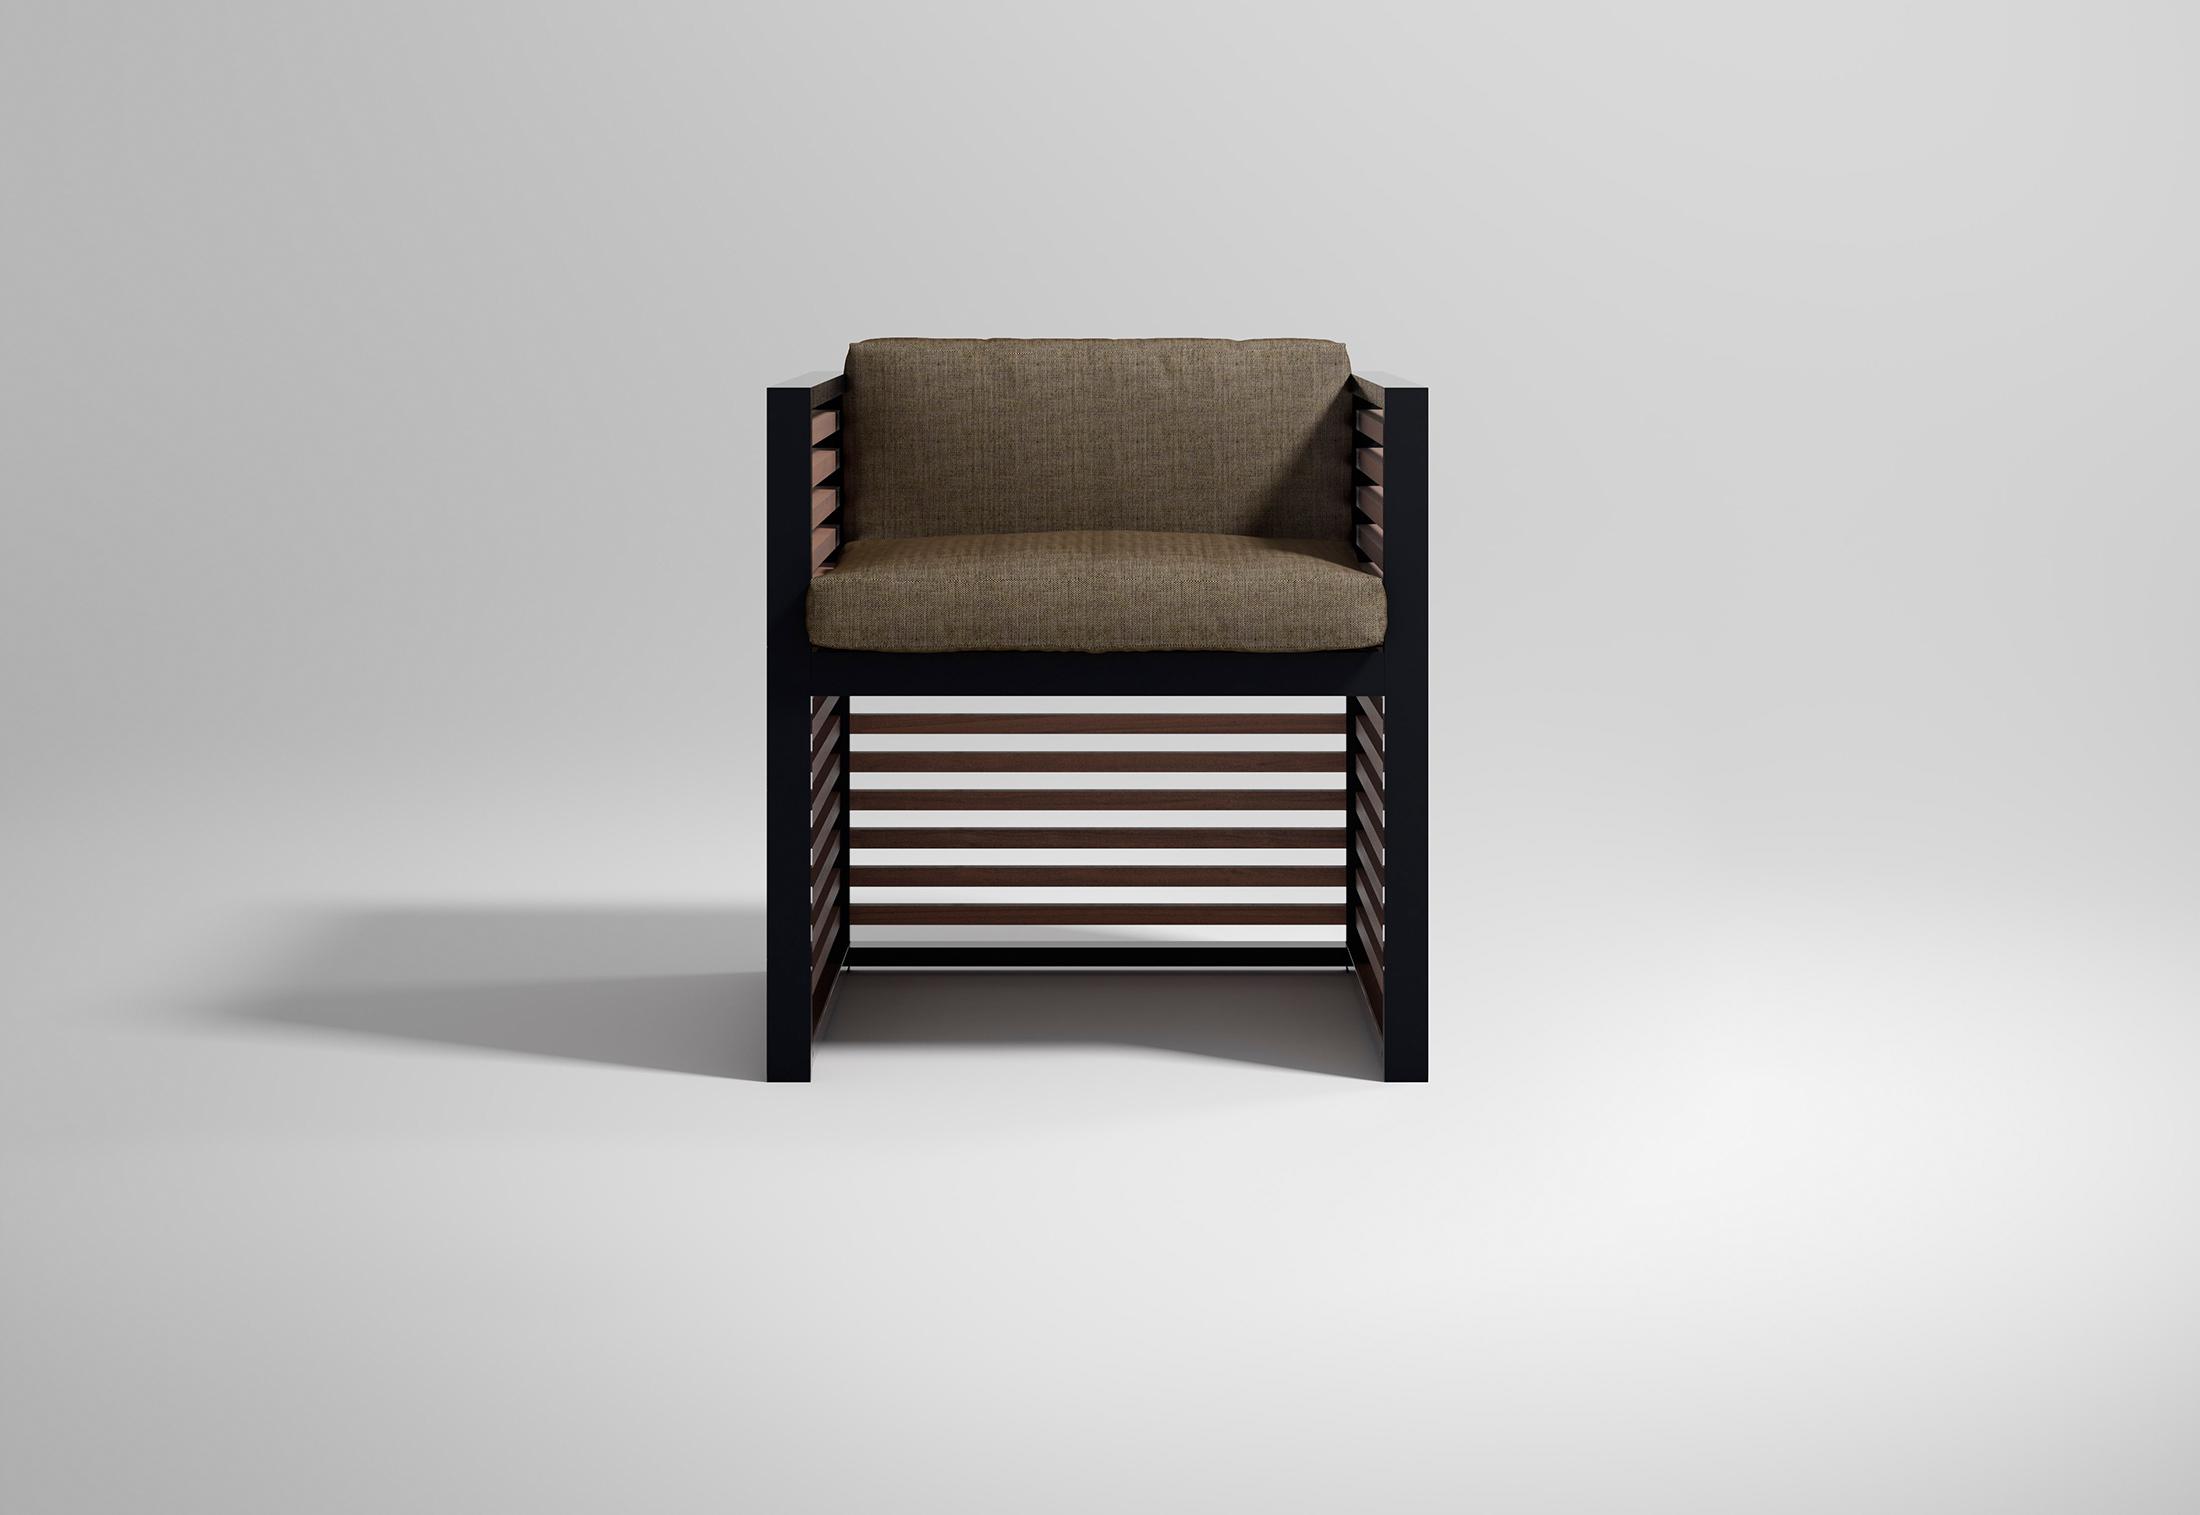 gandia blasco clack chair vaughn tufted slipper dna teak armchair by stylepark